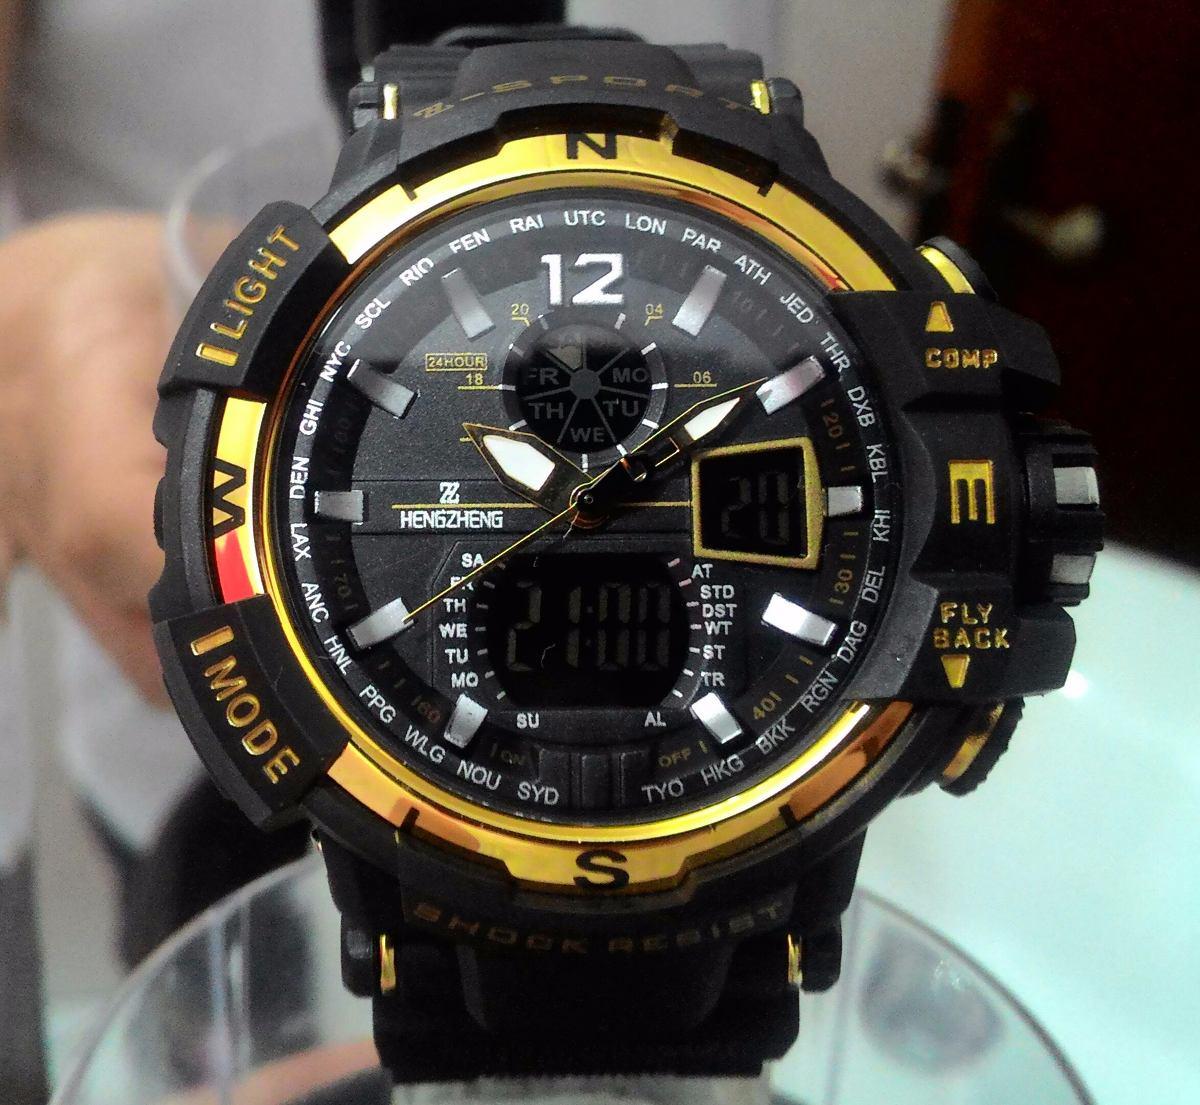 89526f009ef relógio shock masculino pulso digital analogico z sport 490. Carregando  zoom.